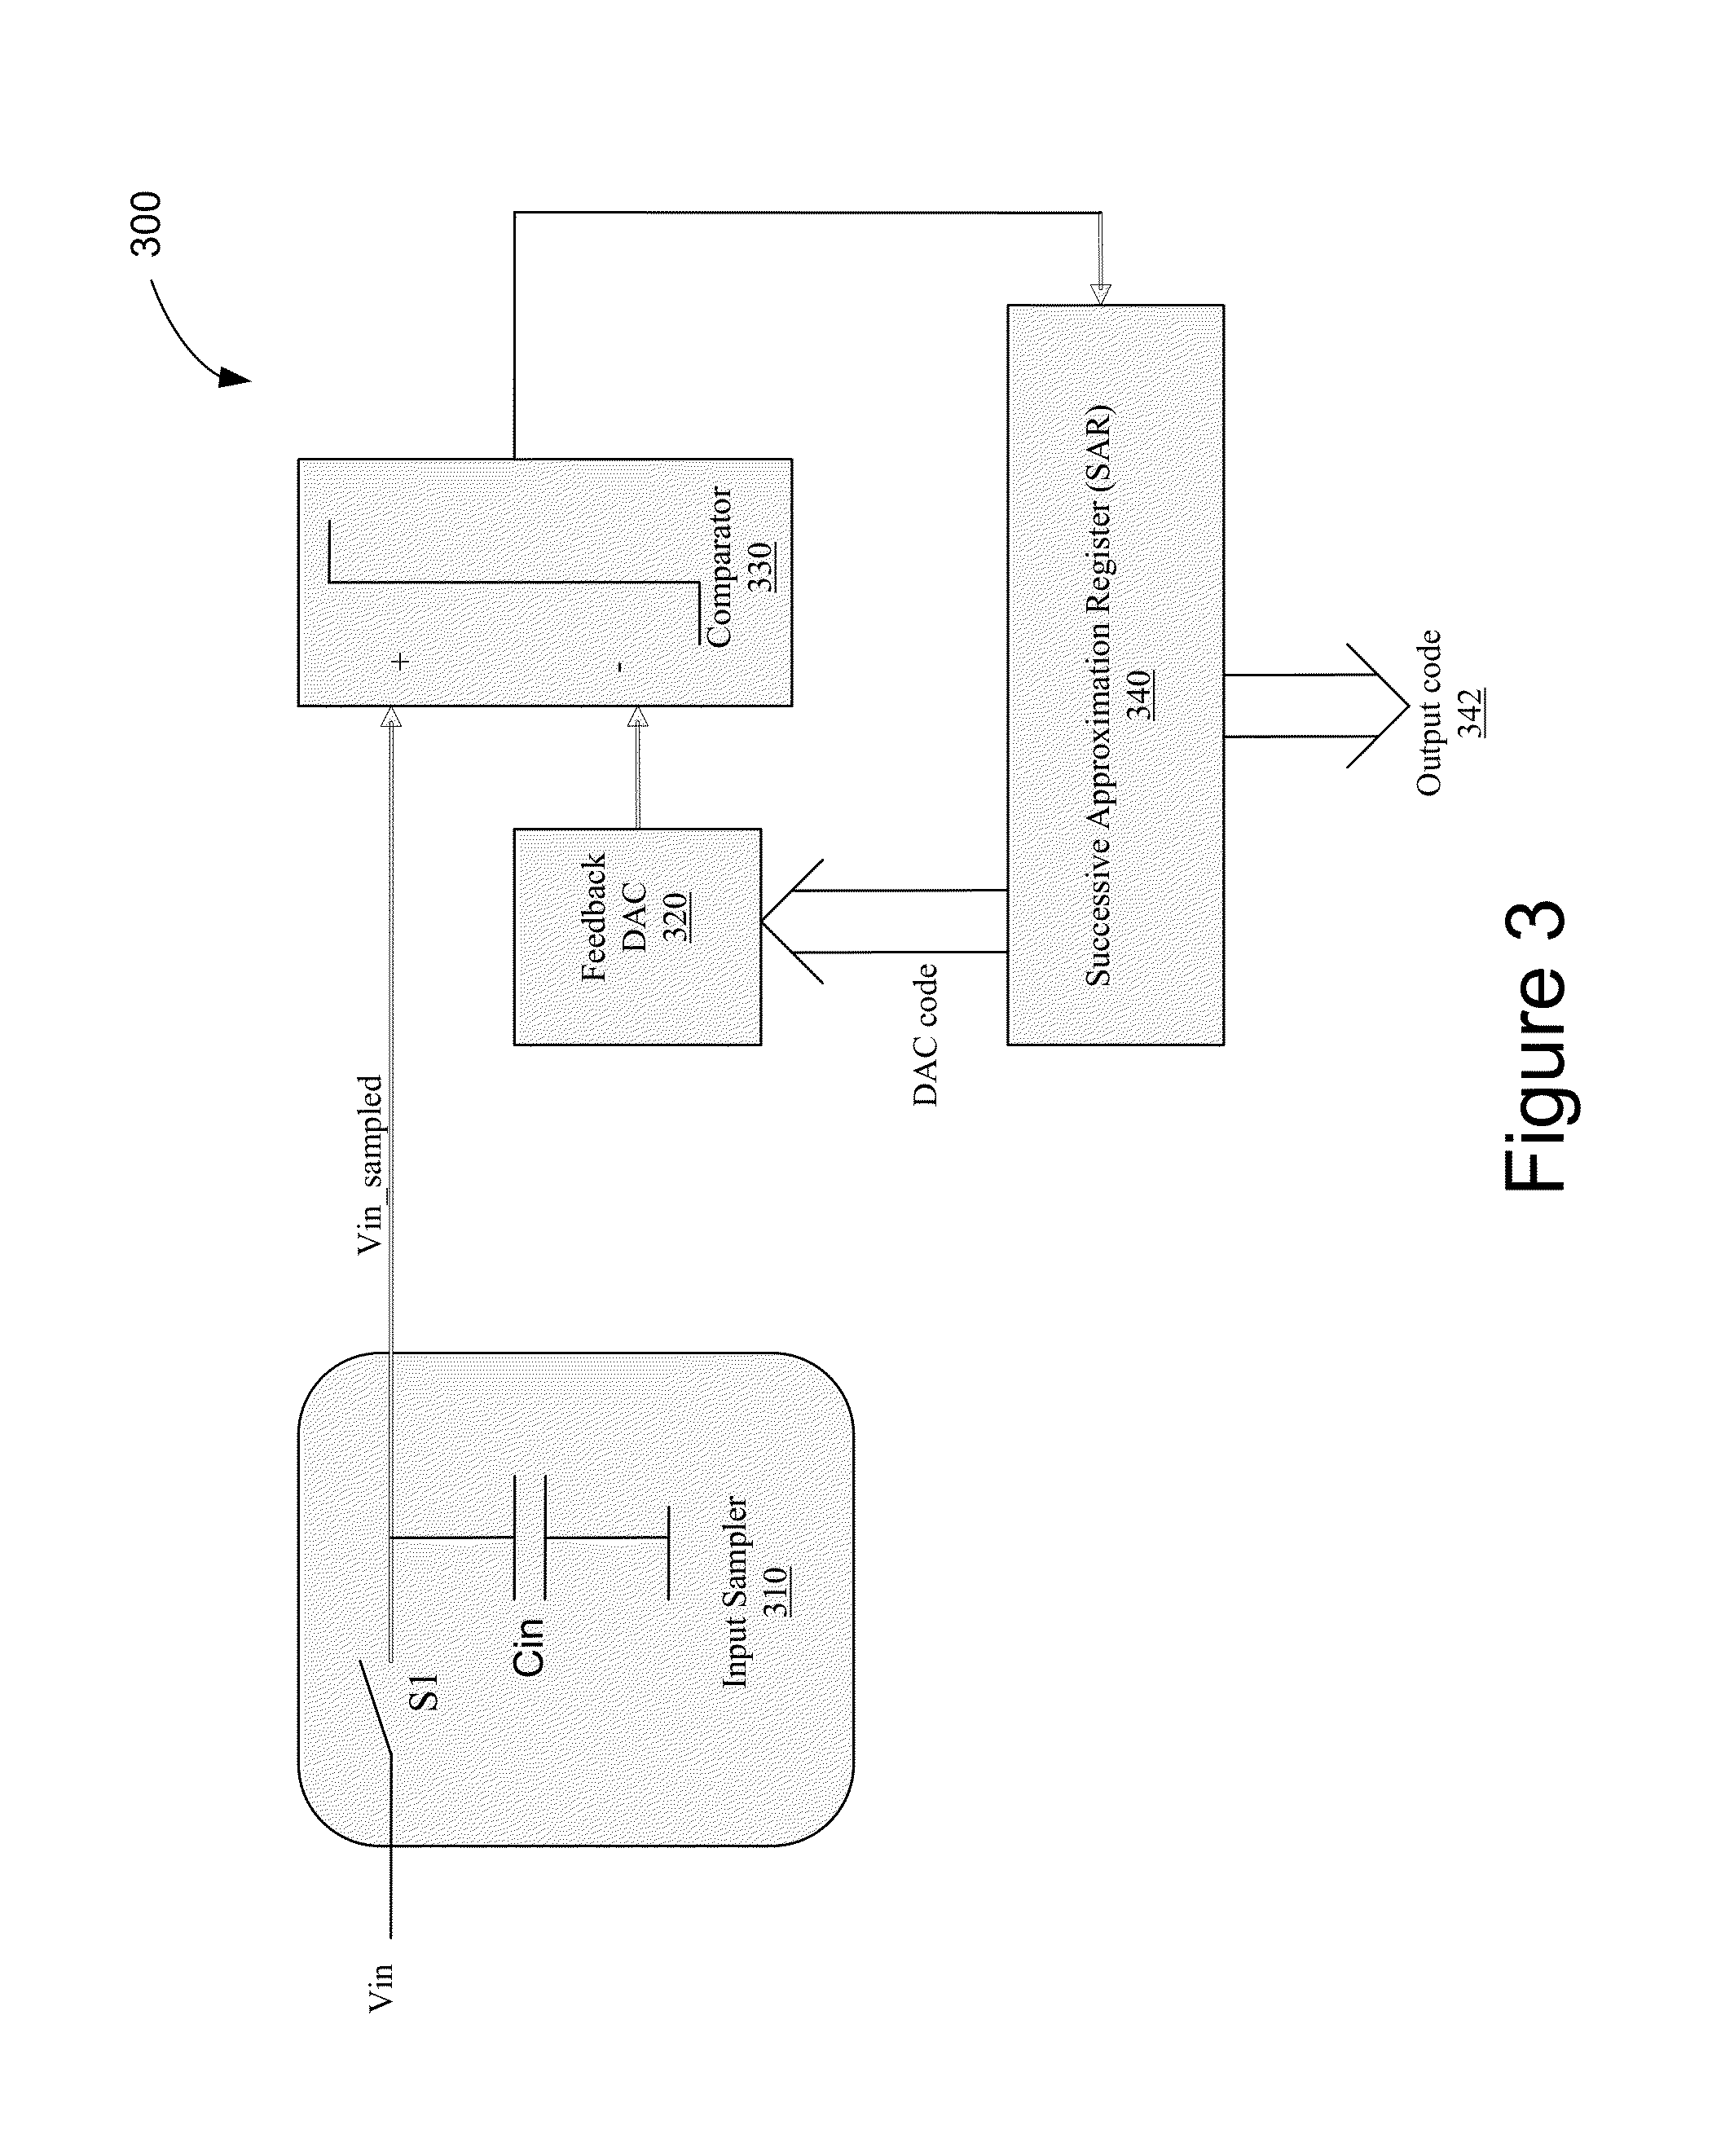 patente us8618975